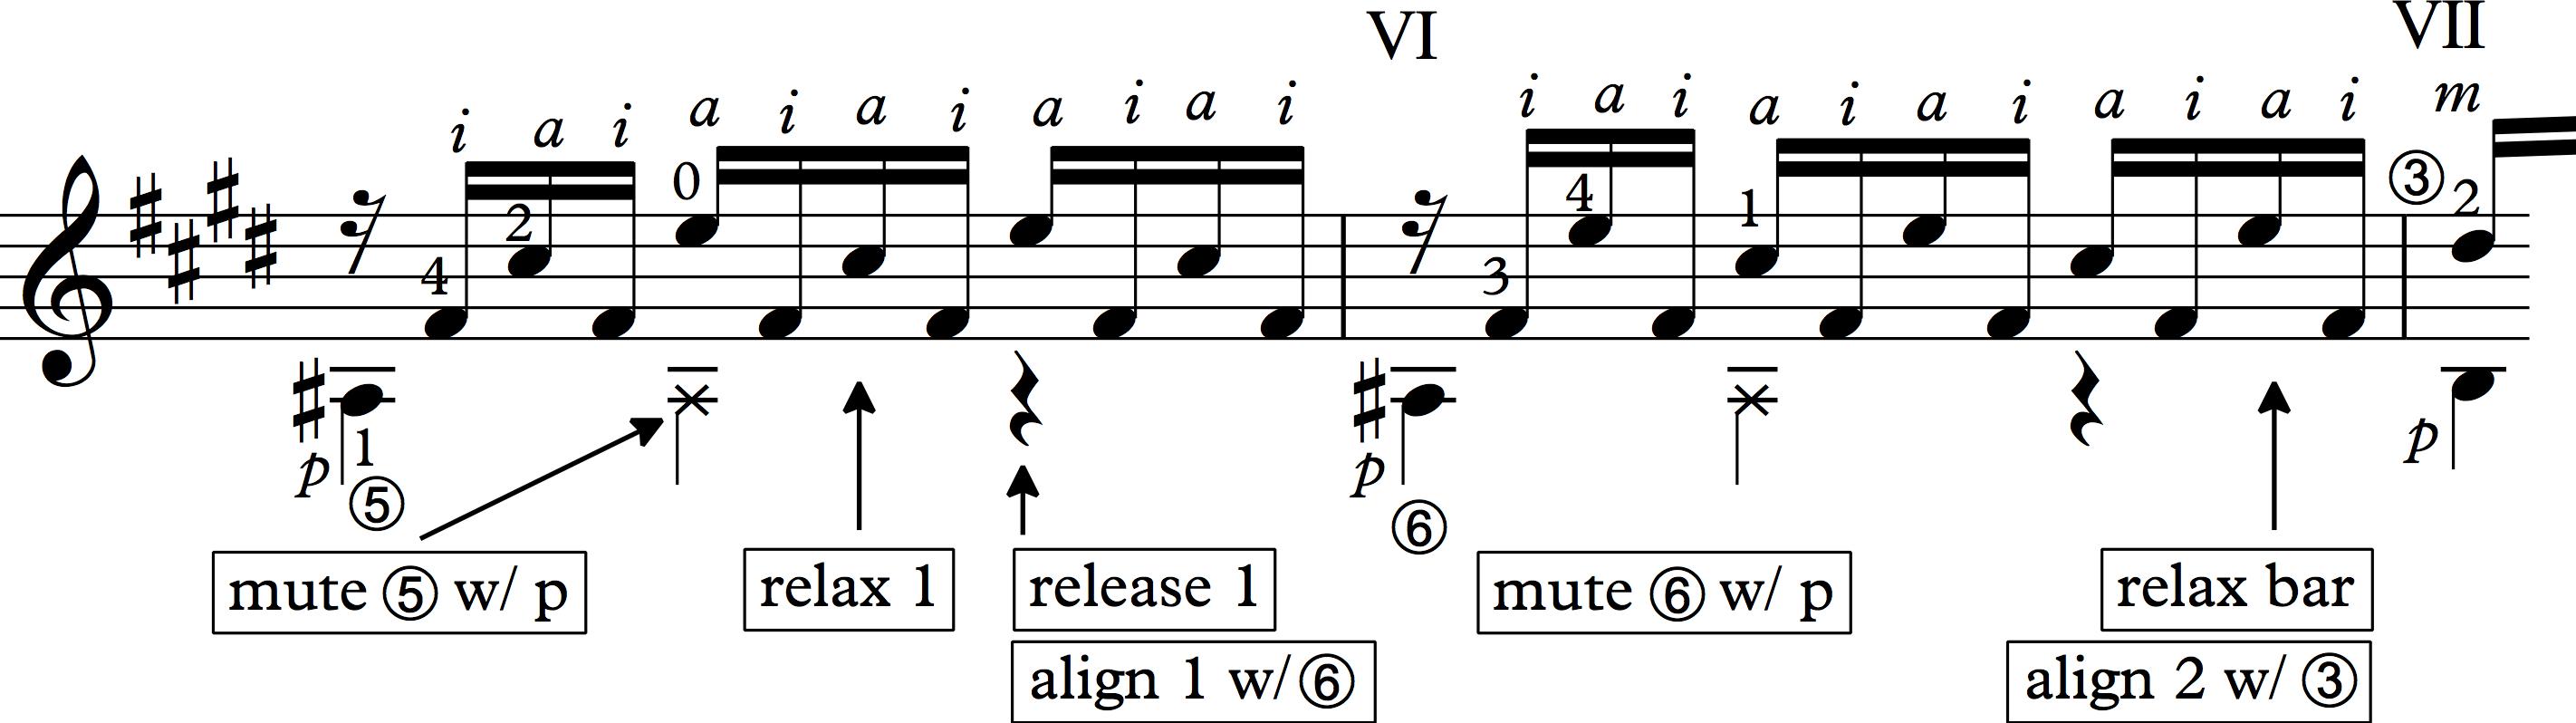 Bach Left Hand choreography.jpg